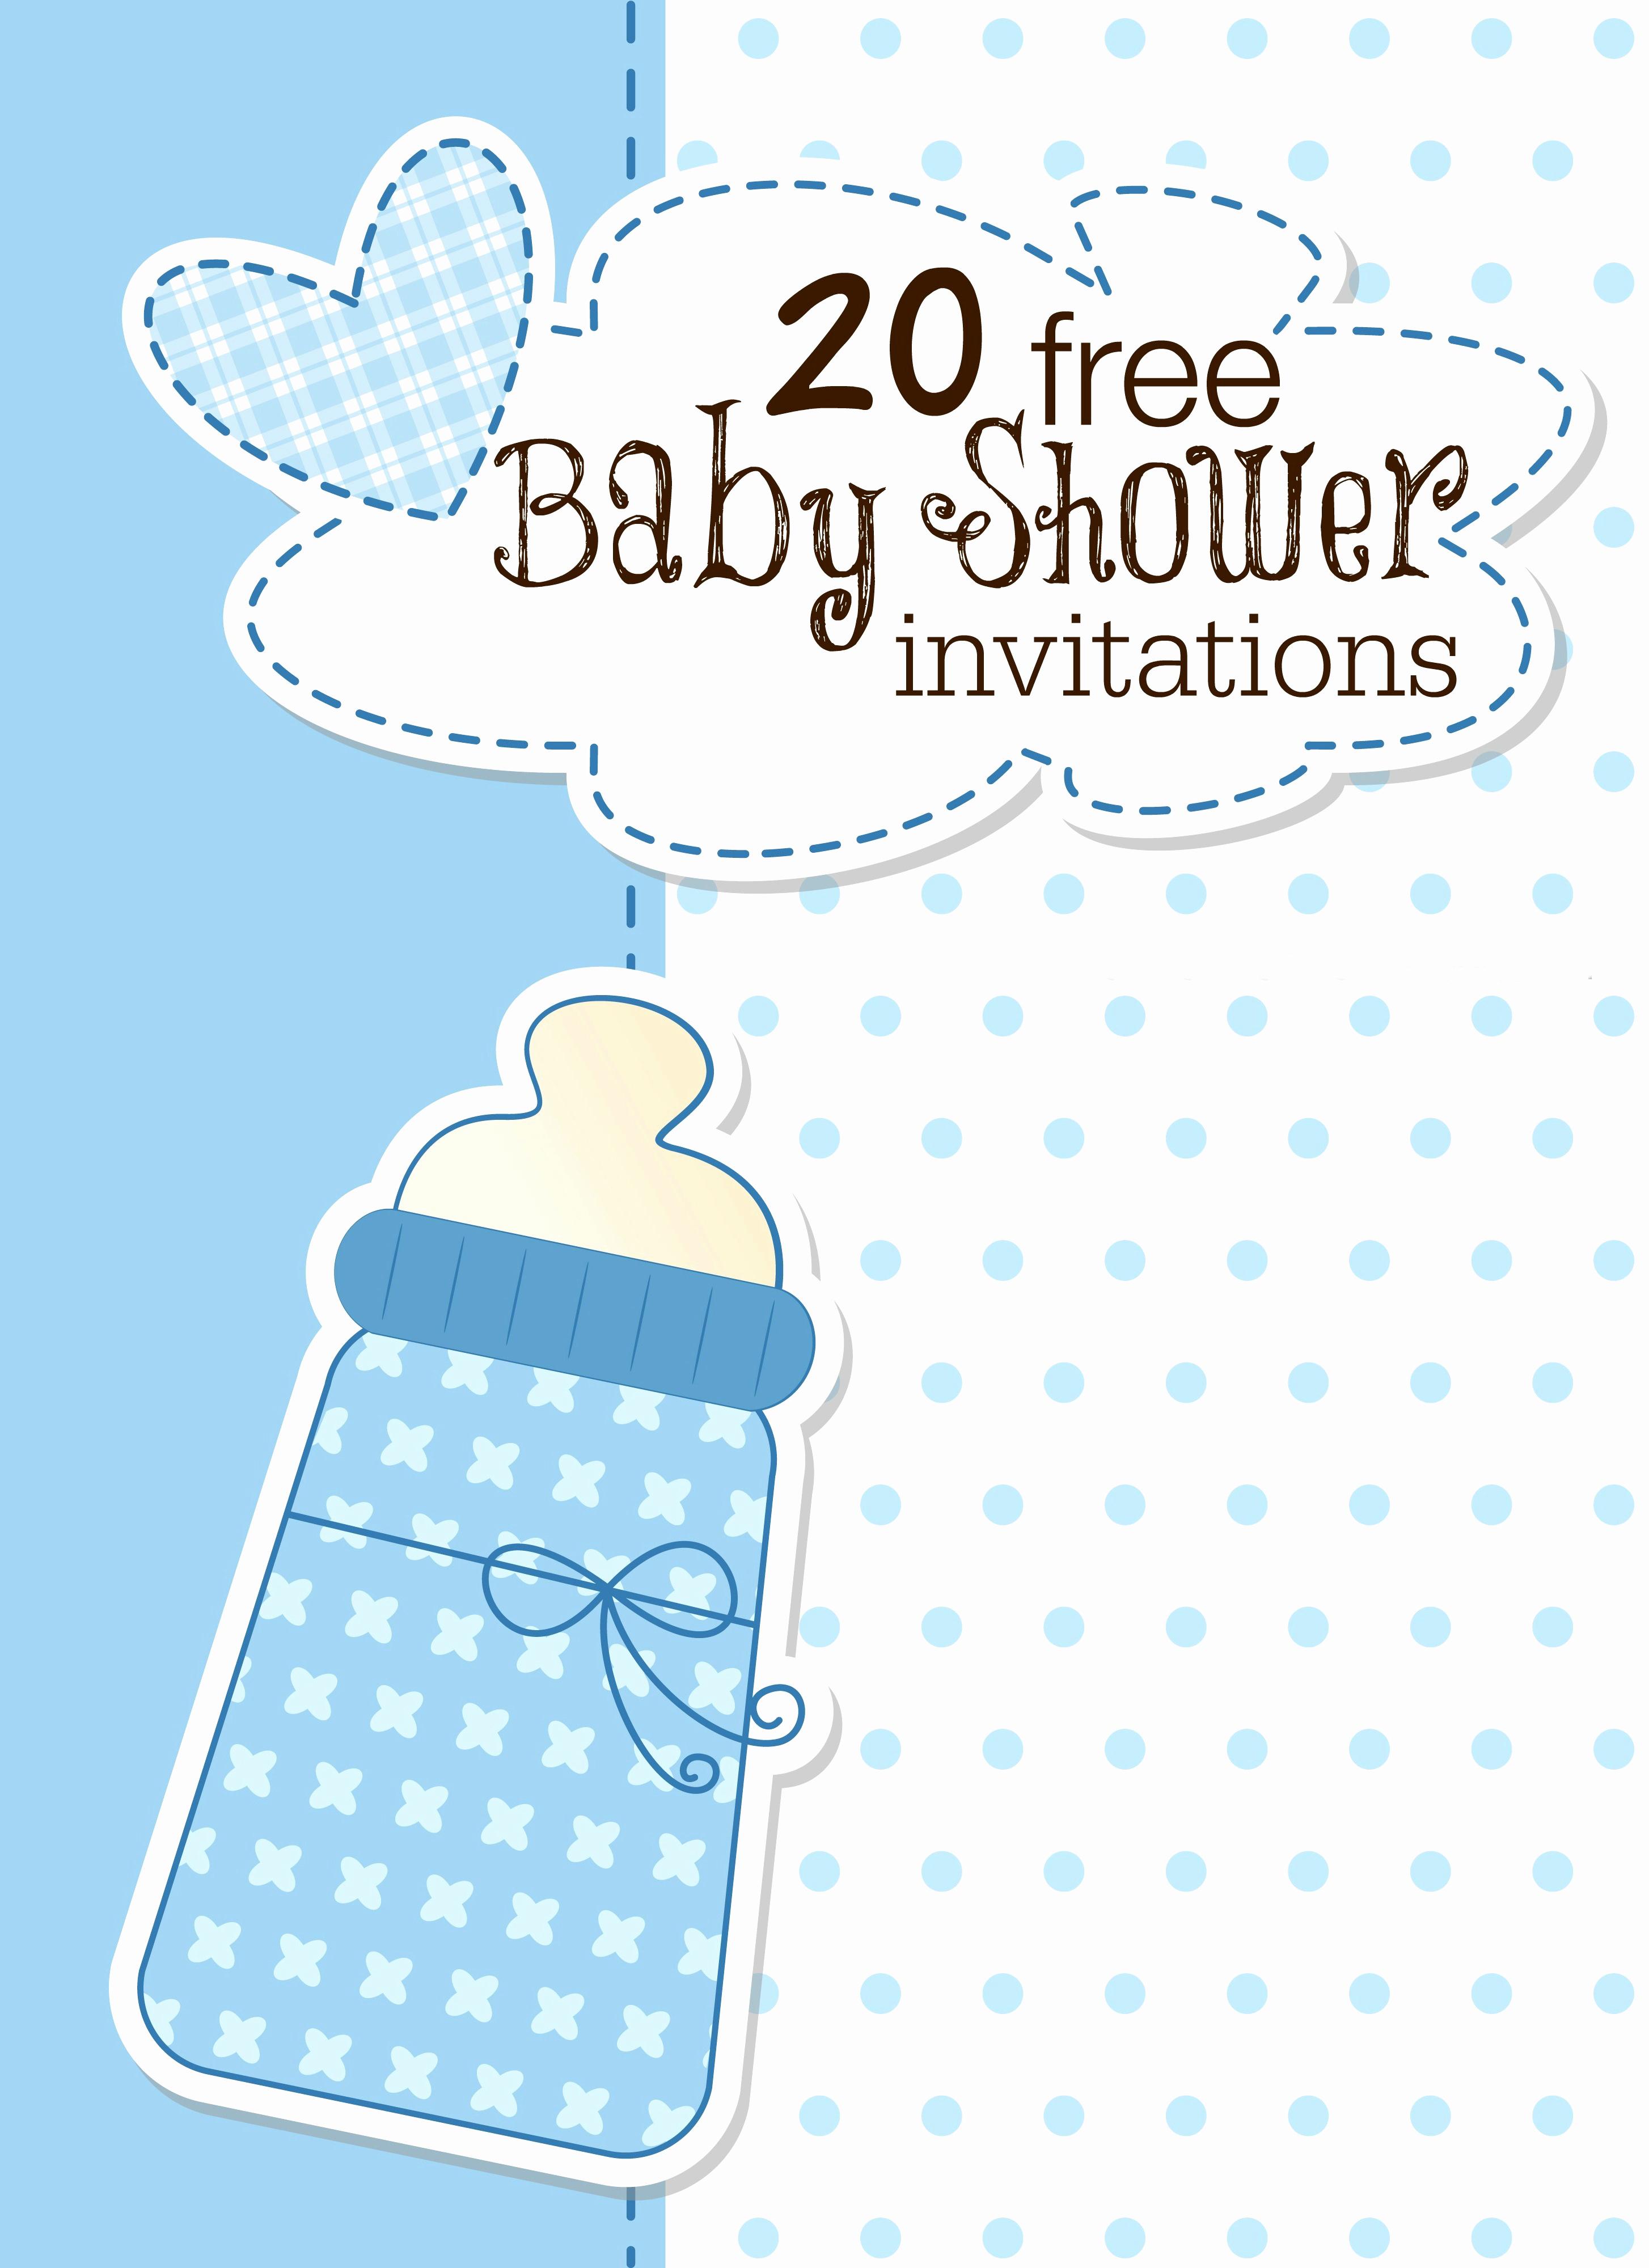 Baby Shower Invitation Free Printable Inspirational Printable Baby Shower Invitations